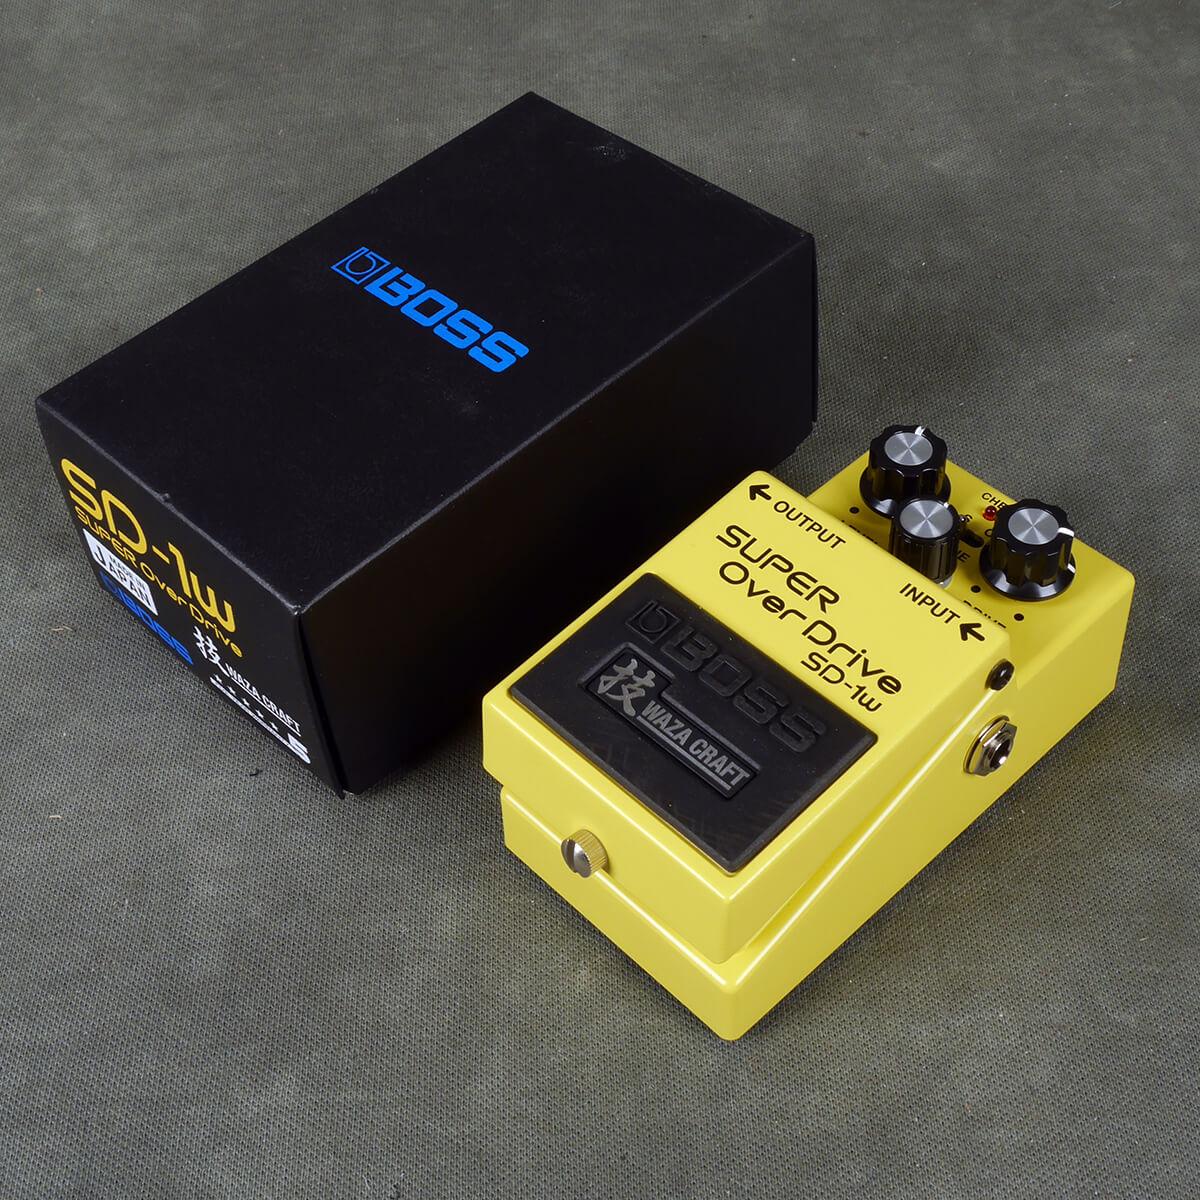 Boss SD-1W Waza Overdrive FX Pedal w/Box - 2nd Hand